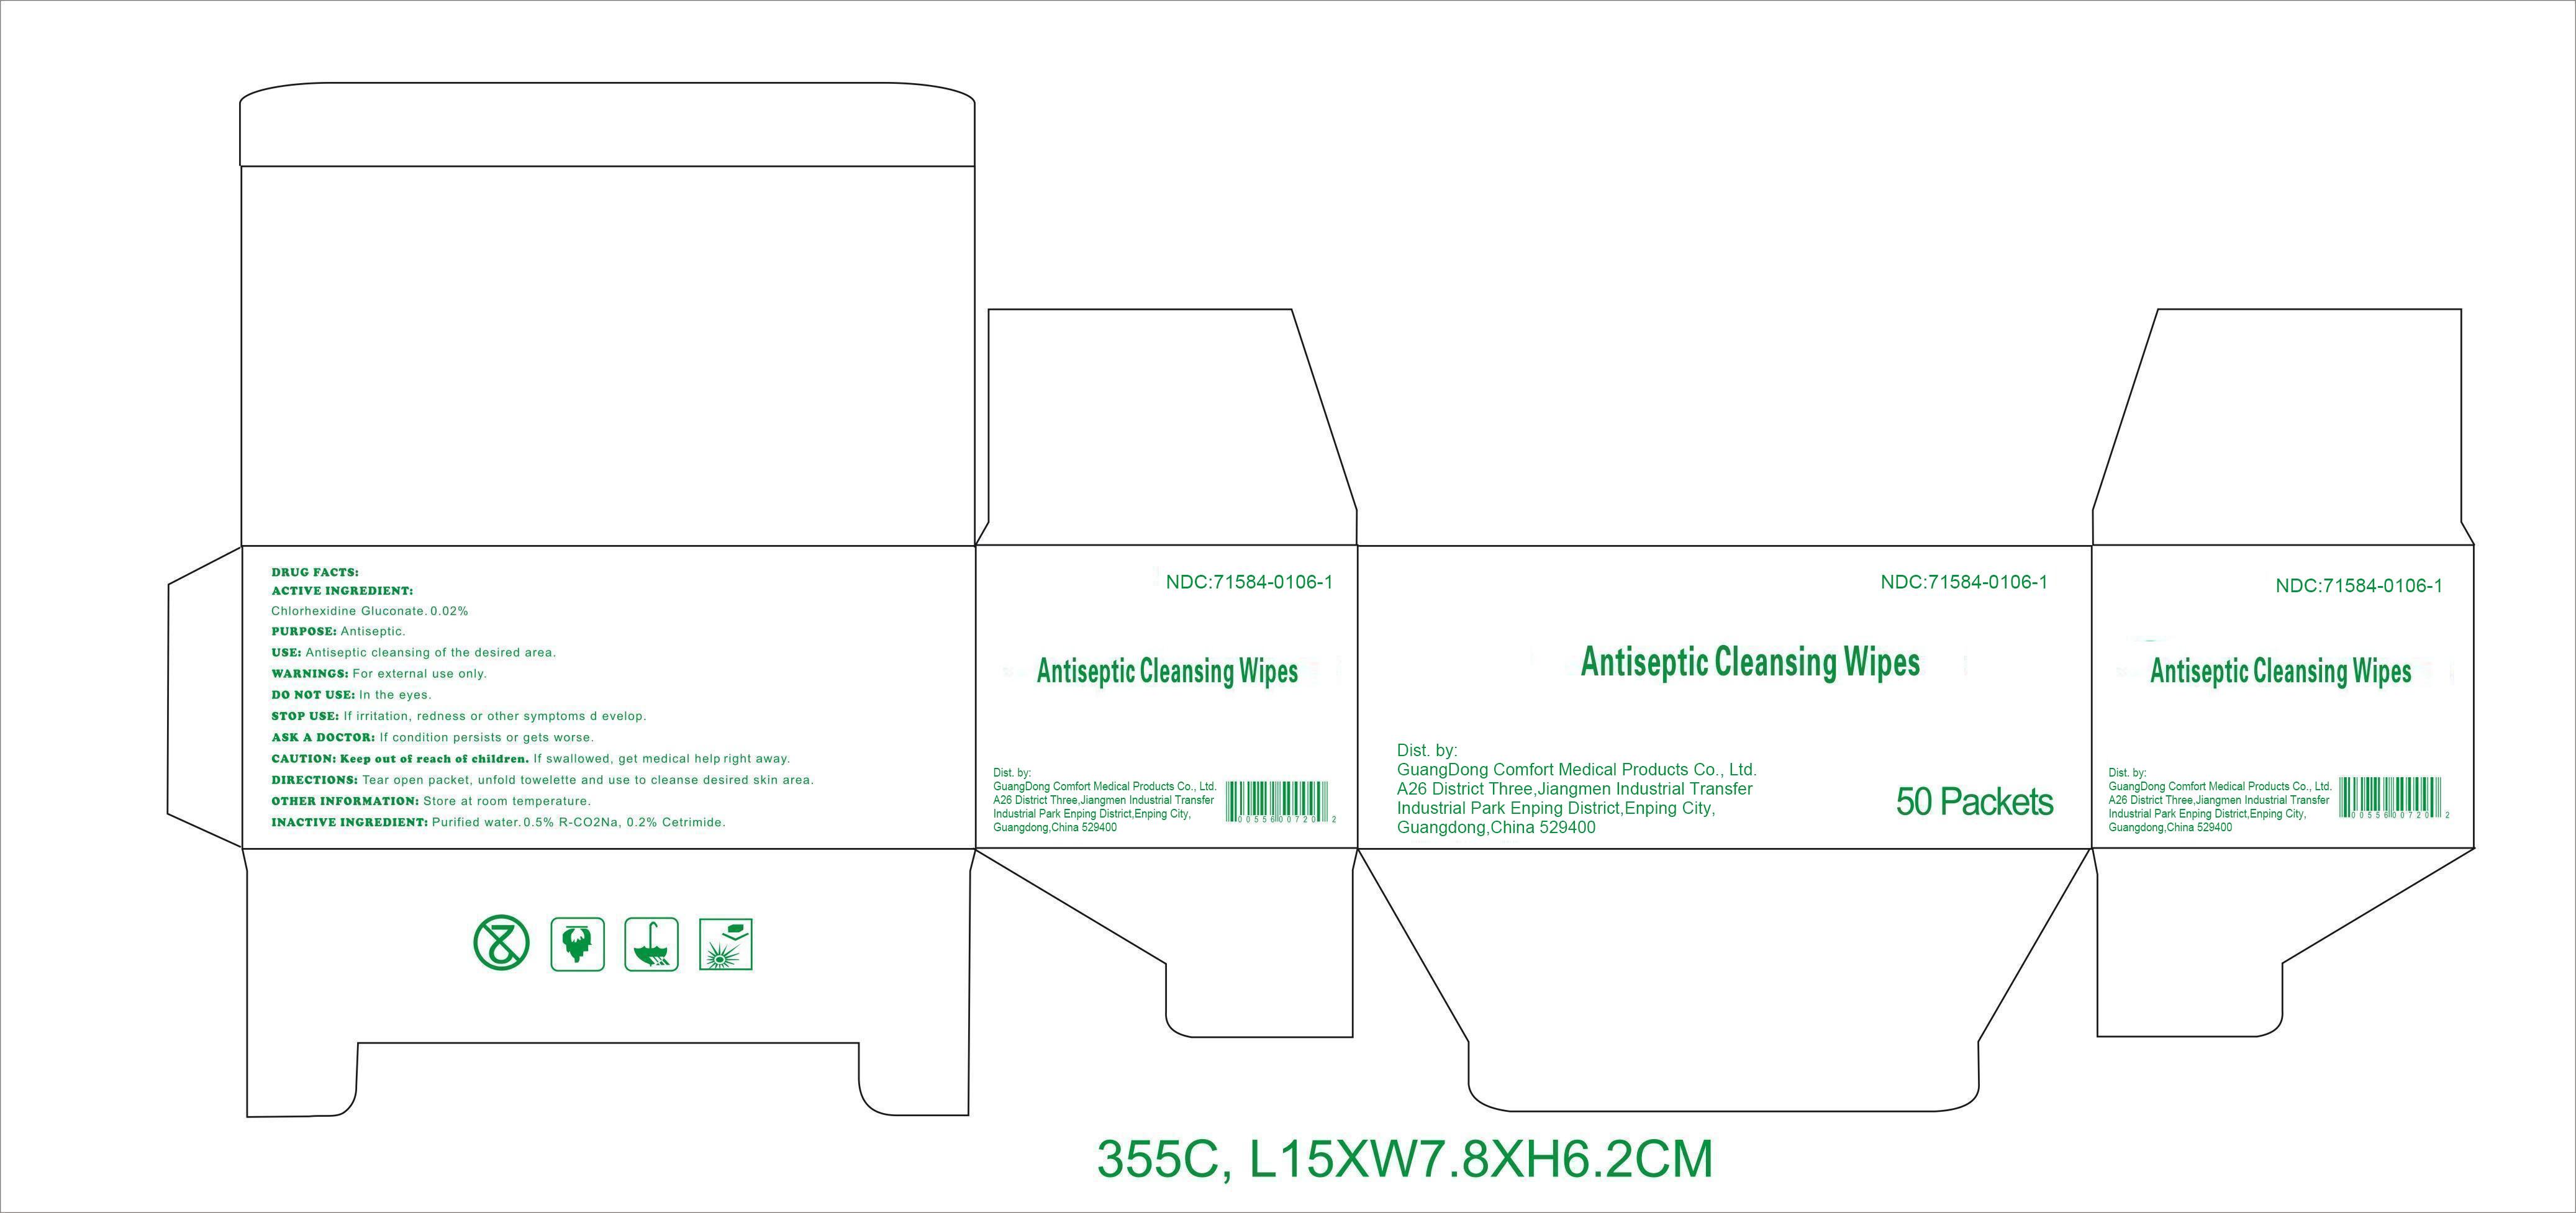 image of carton labeling